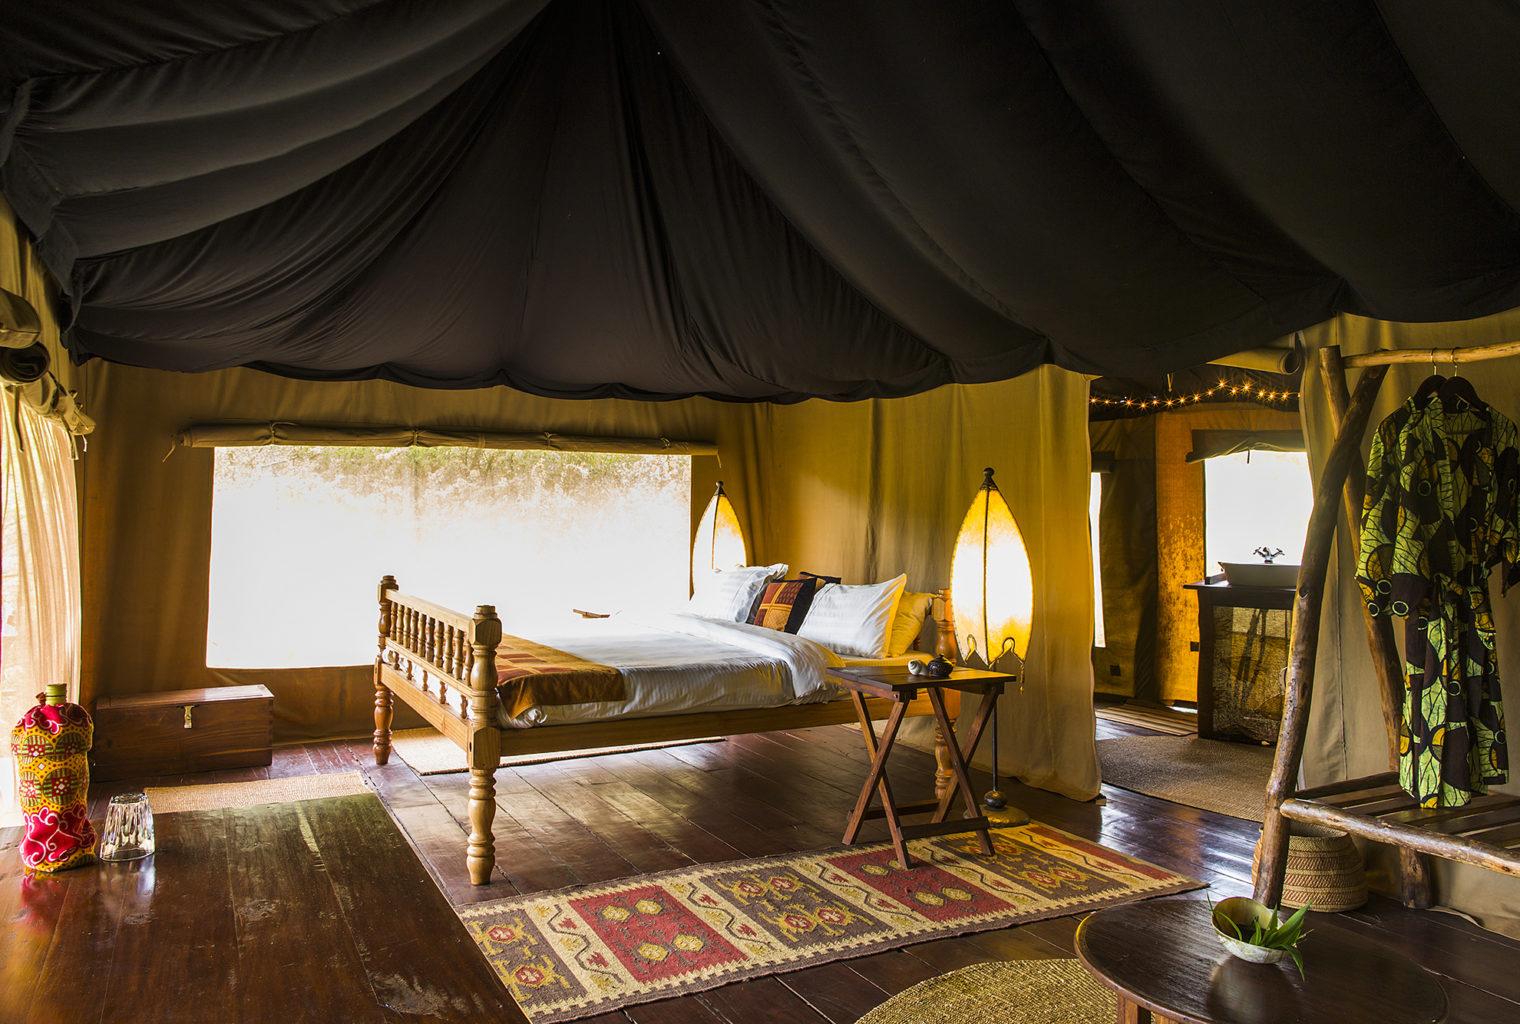 Ndarakwai Camp Tanzania Bed